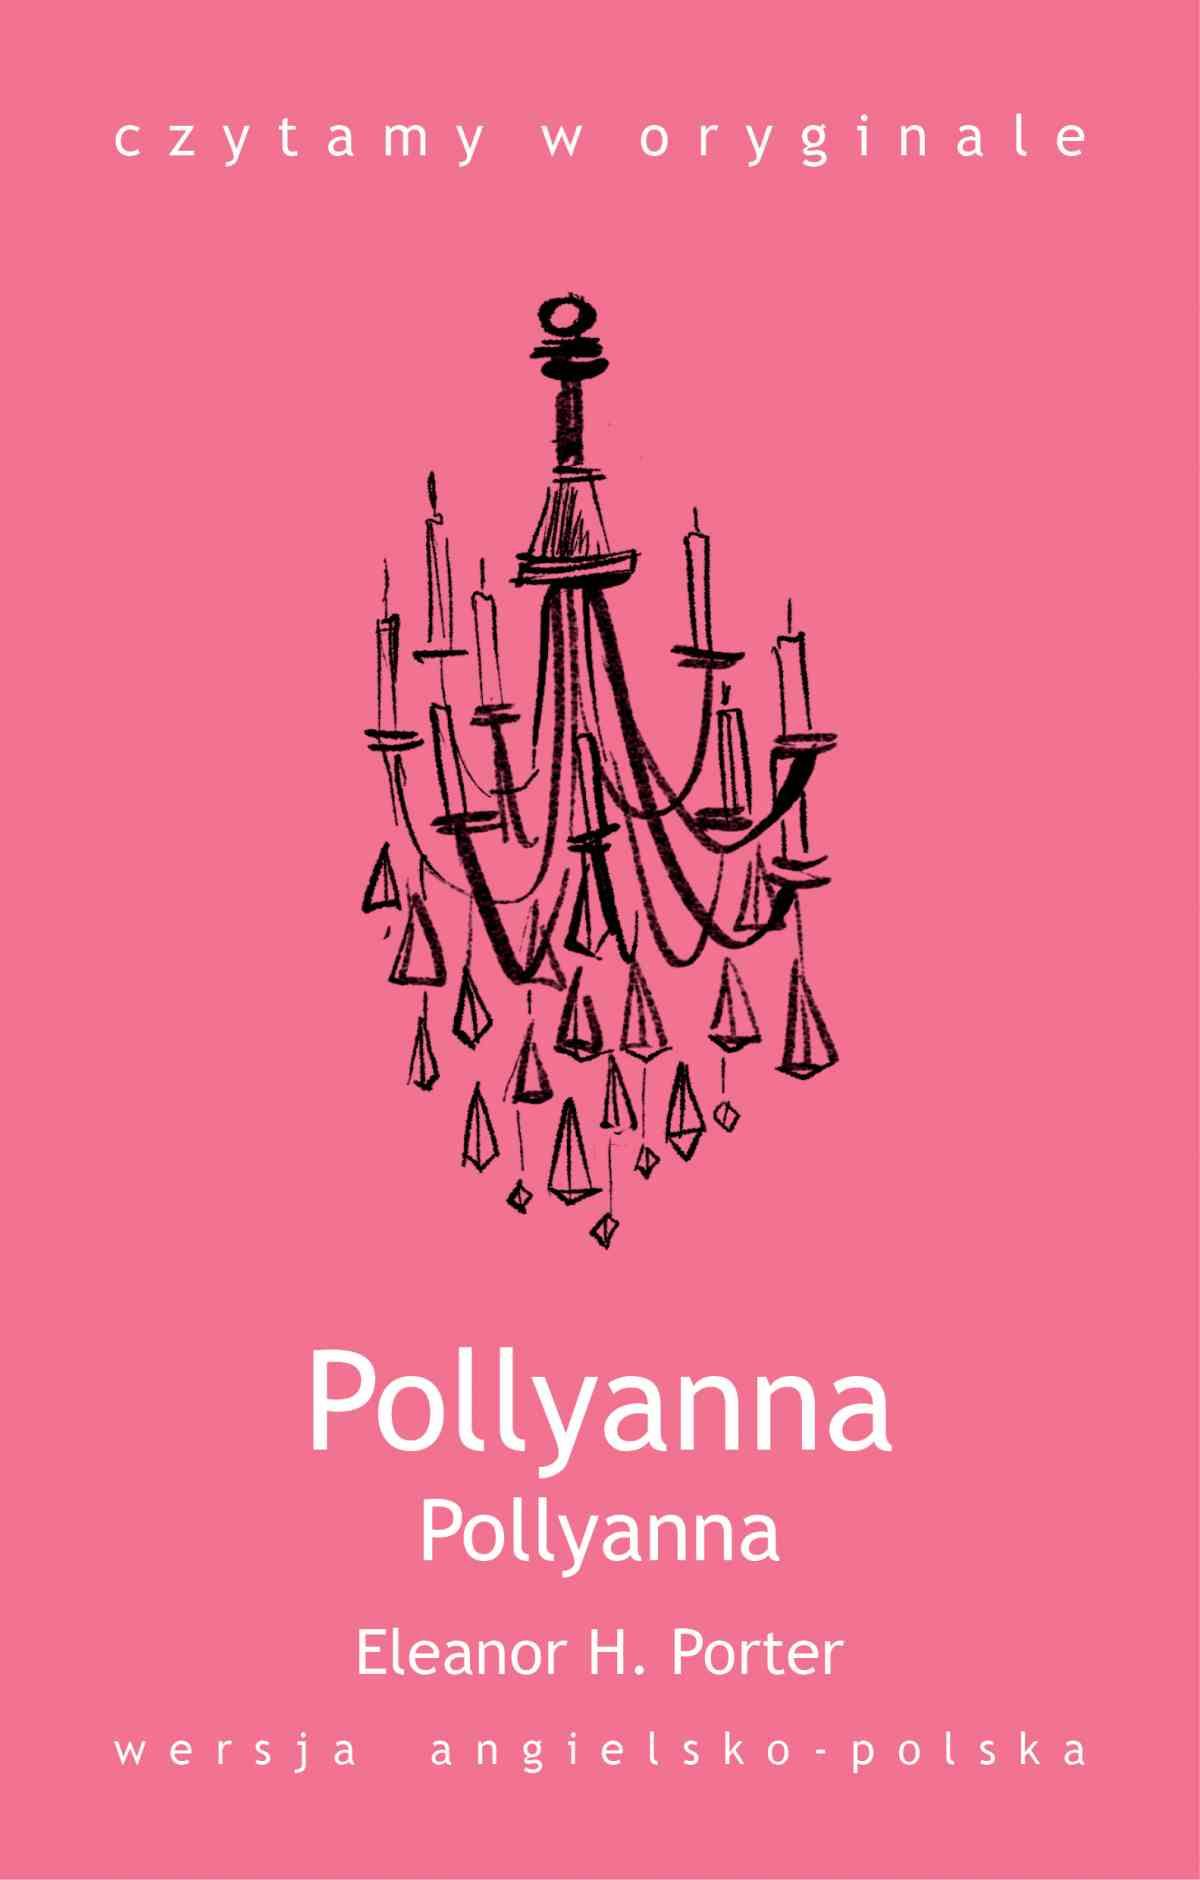 Pollyanna - Ebook (Książka EPUB) do pobrania w formacie EPUB